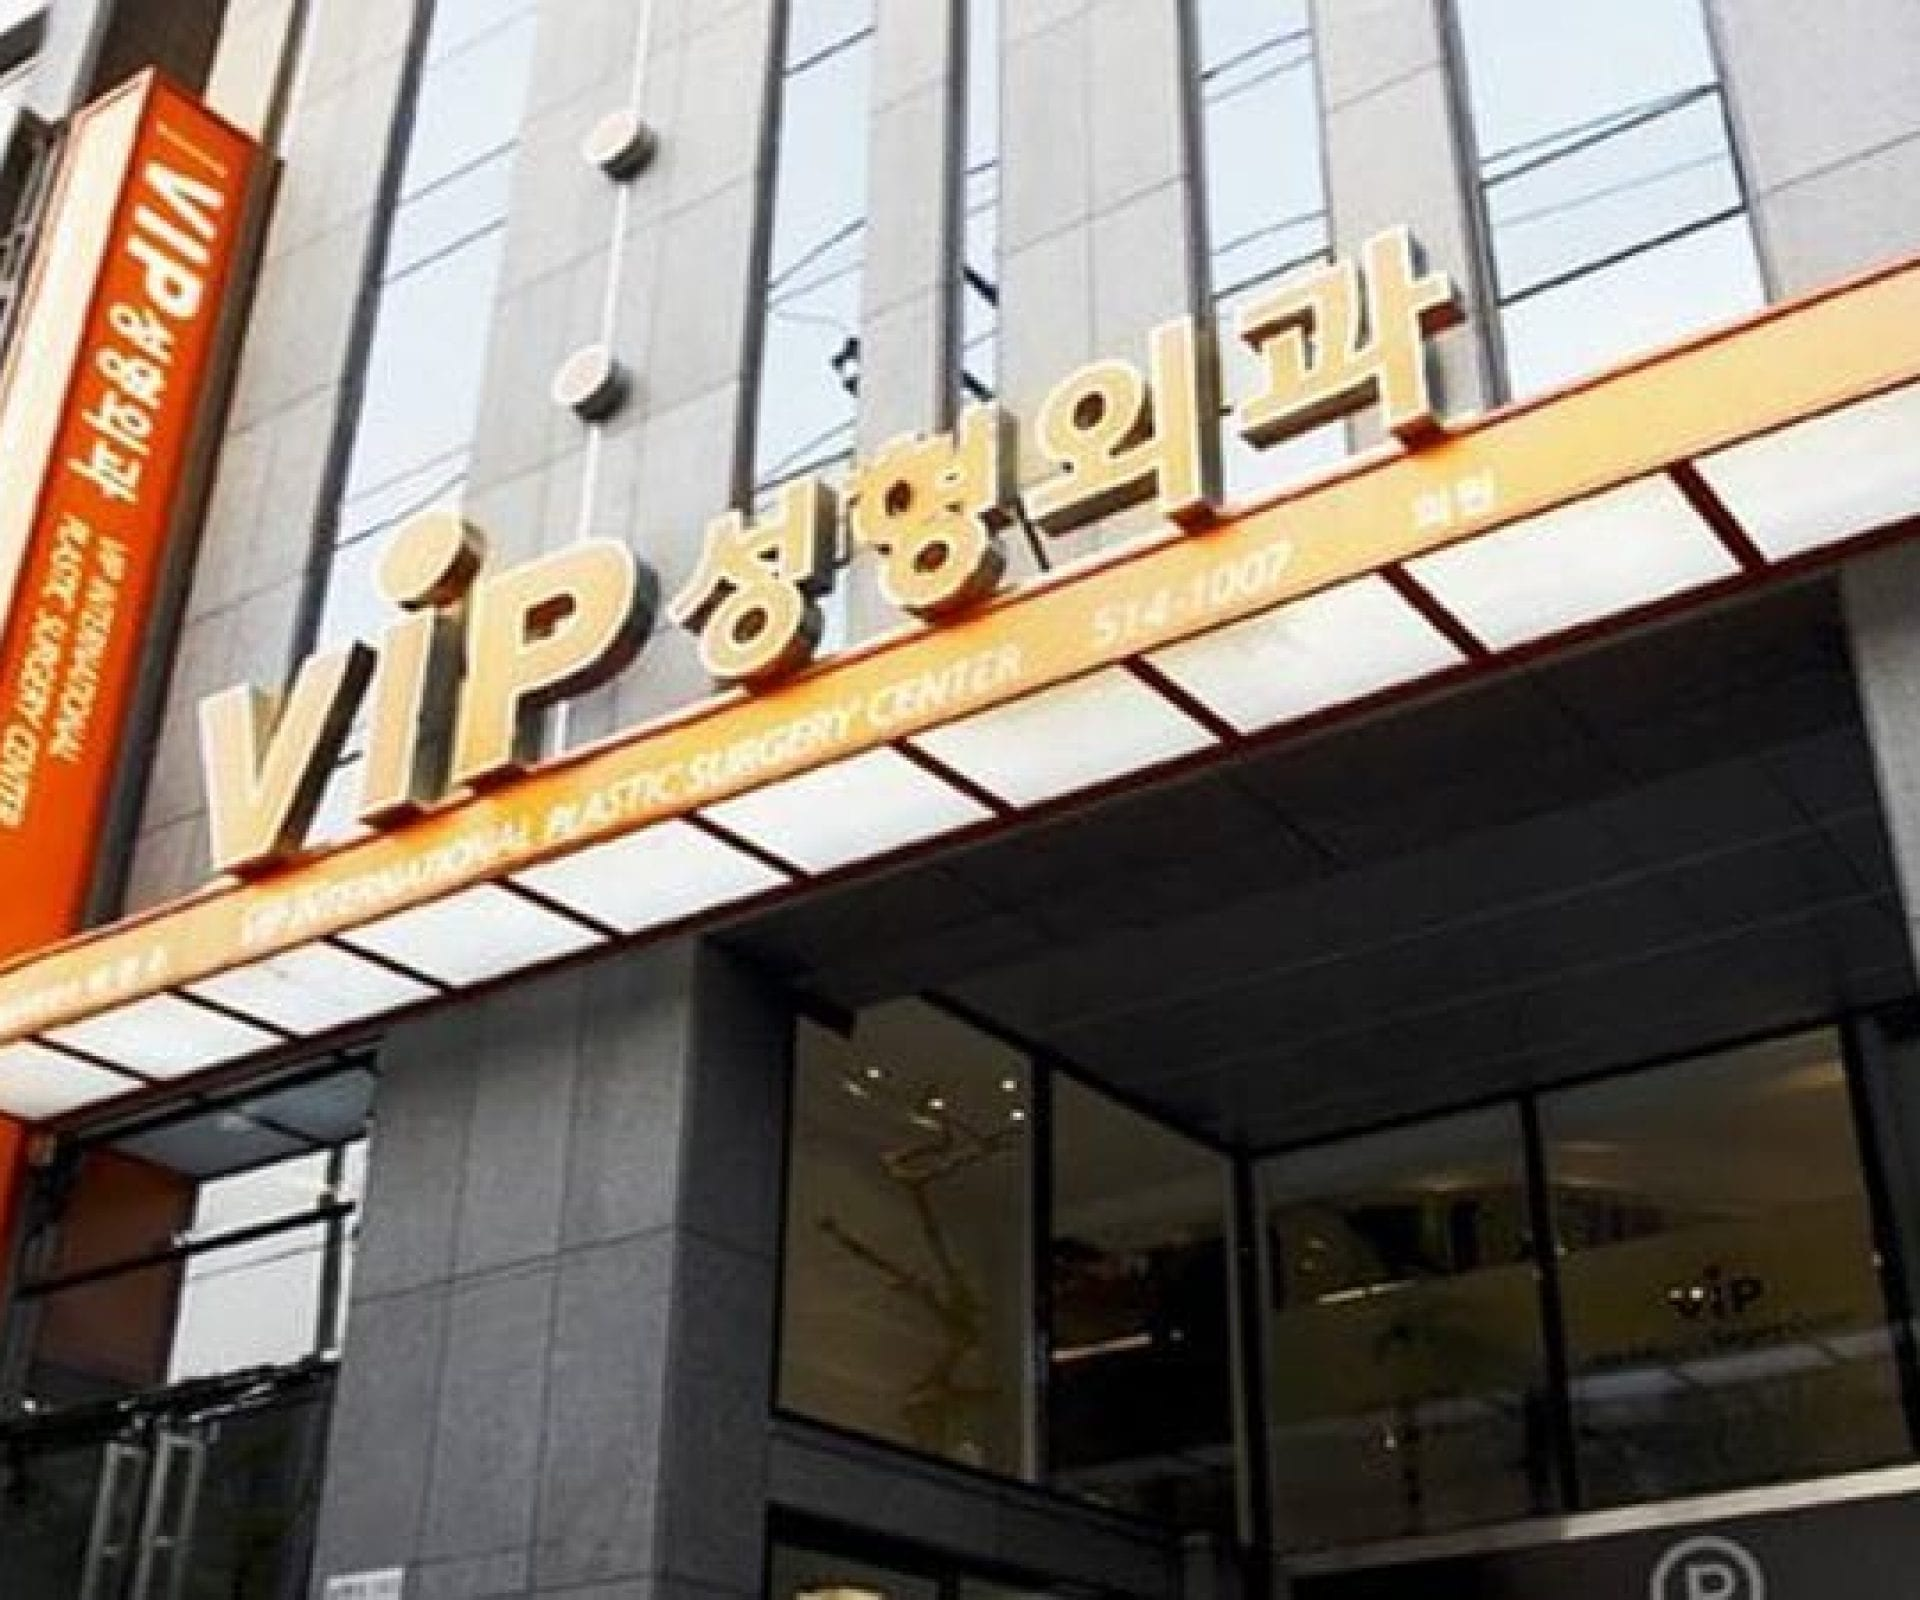 VIP International Plastic Surgery Center | Gangnam-gu, Seoul